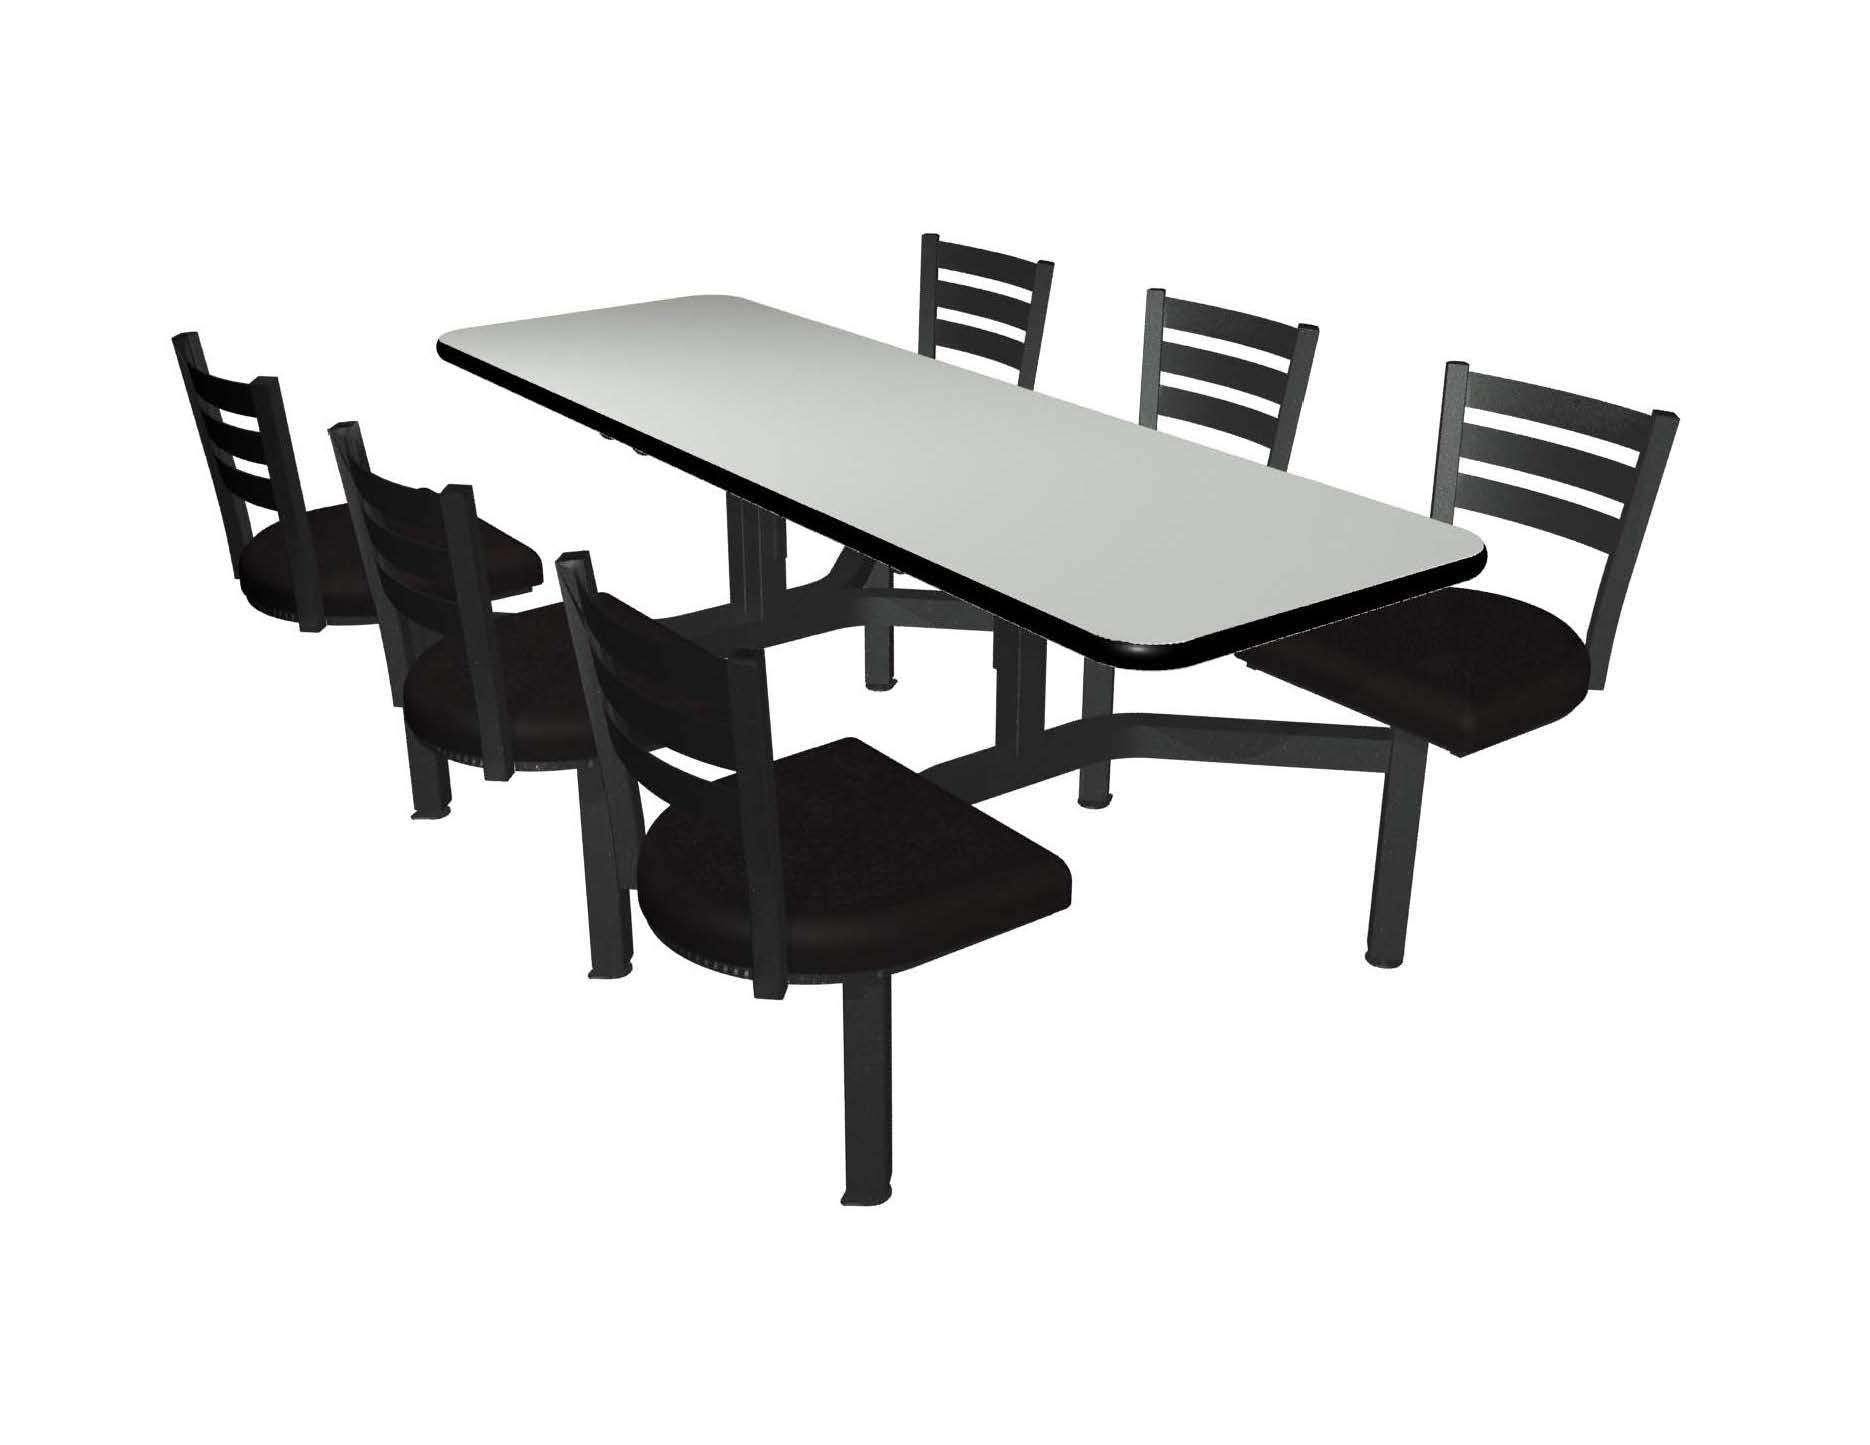 Dove Grey laminate table top, Black vinyl edge, Quest chairhead with black vinyl seat